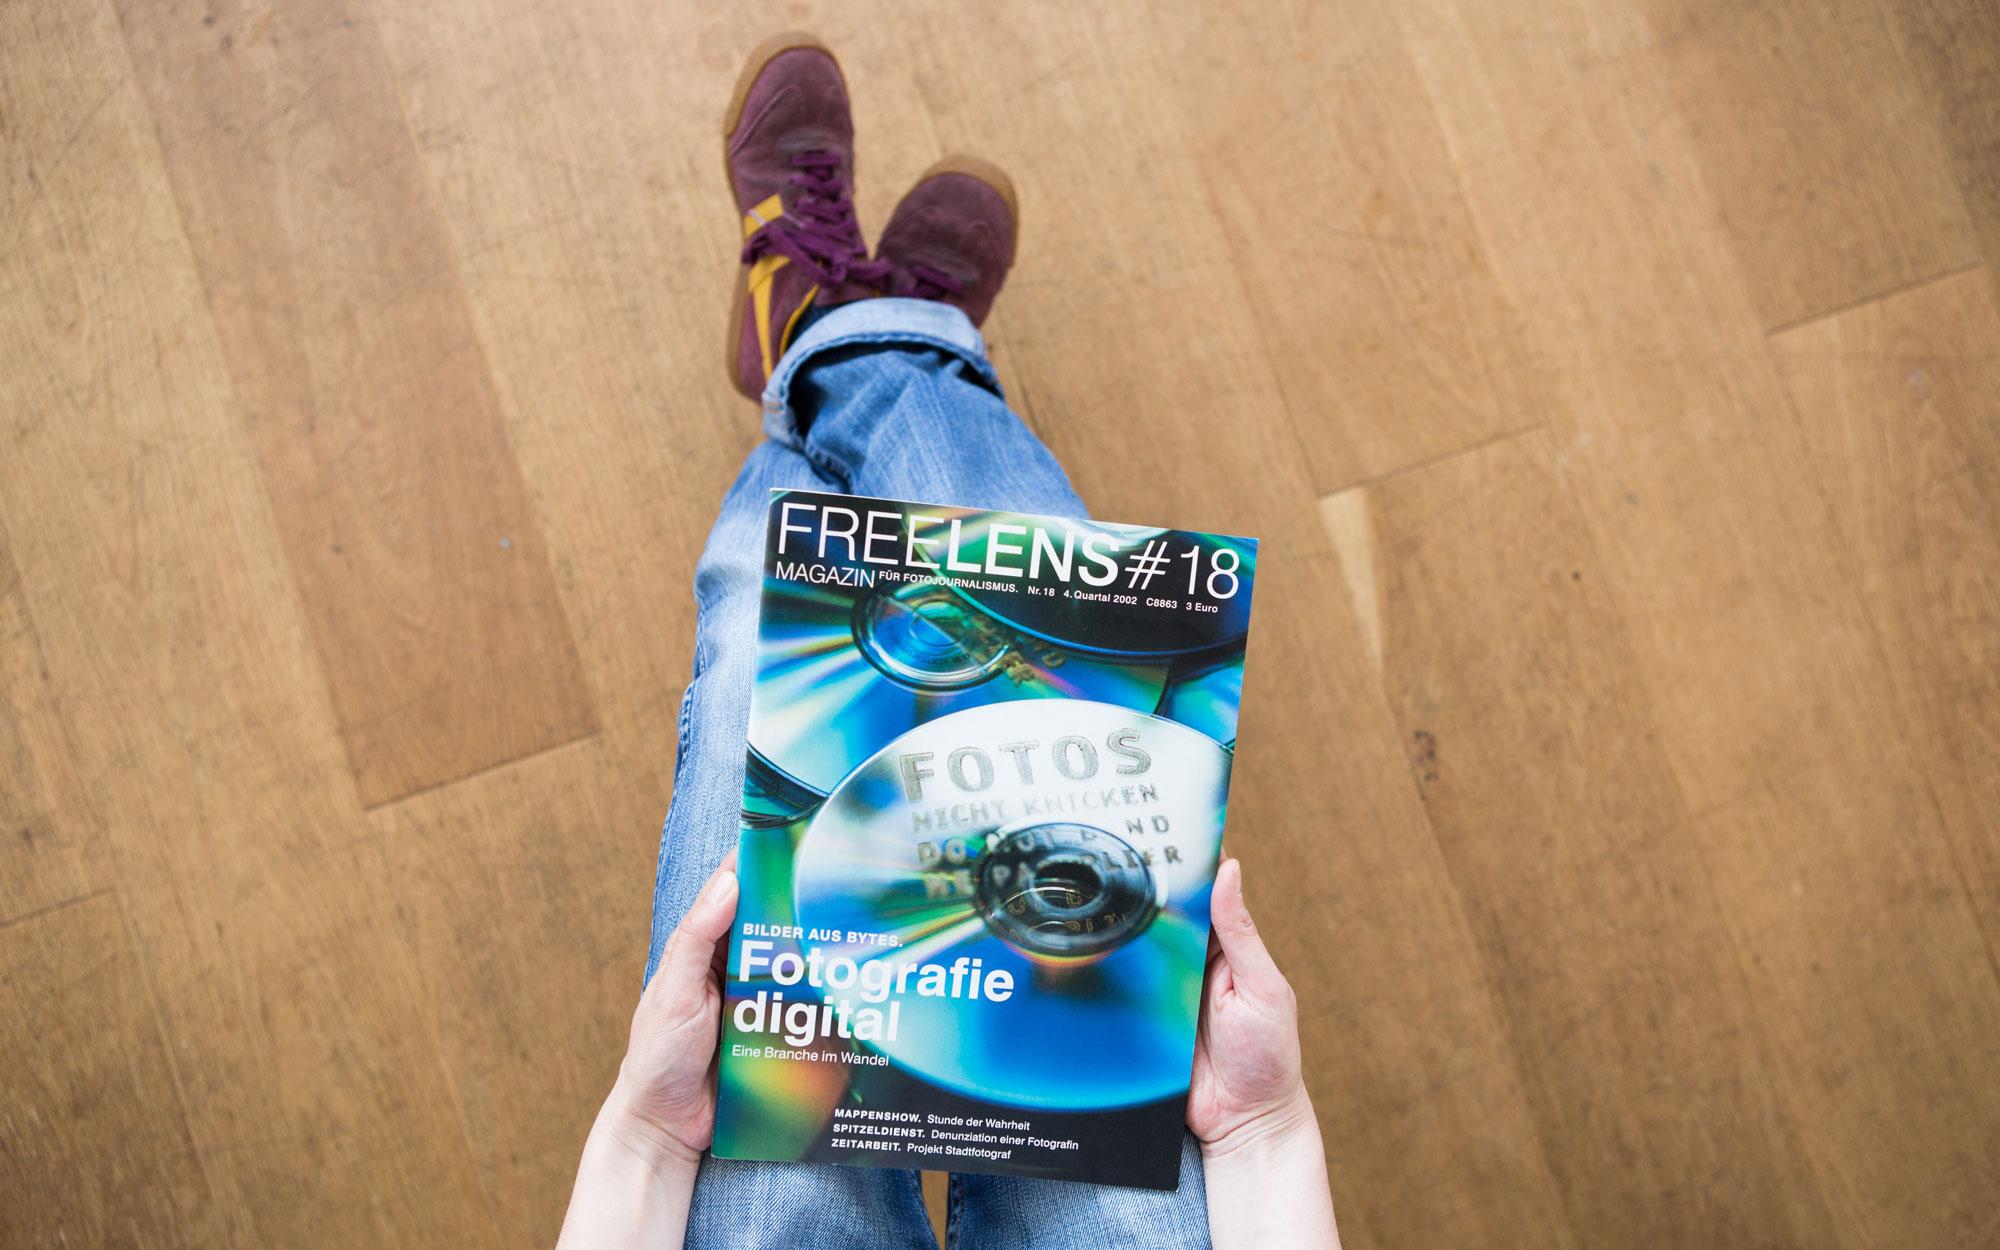 FREELENS Magazin #18. Foto: Lucas Wahl